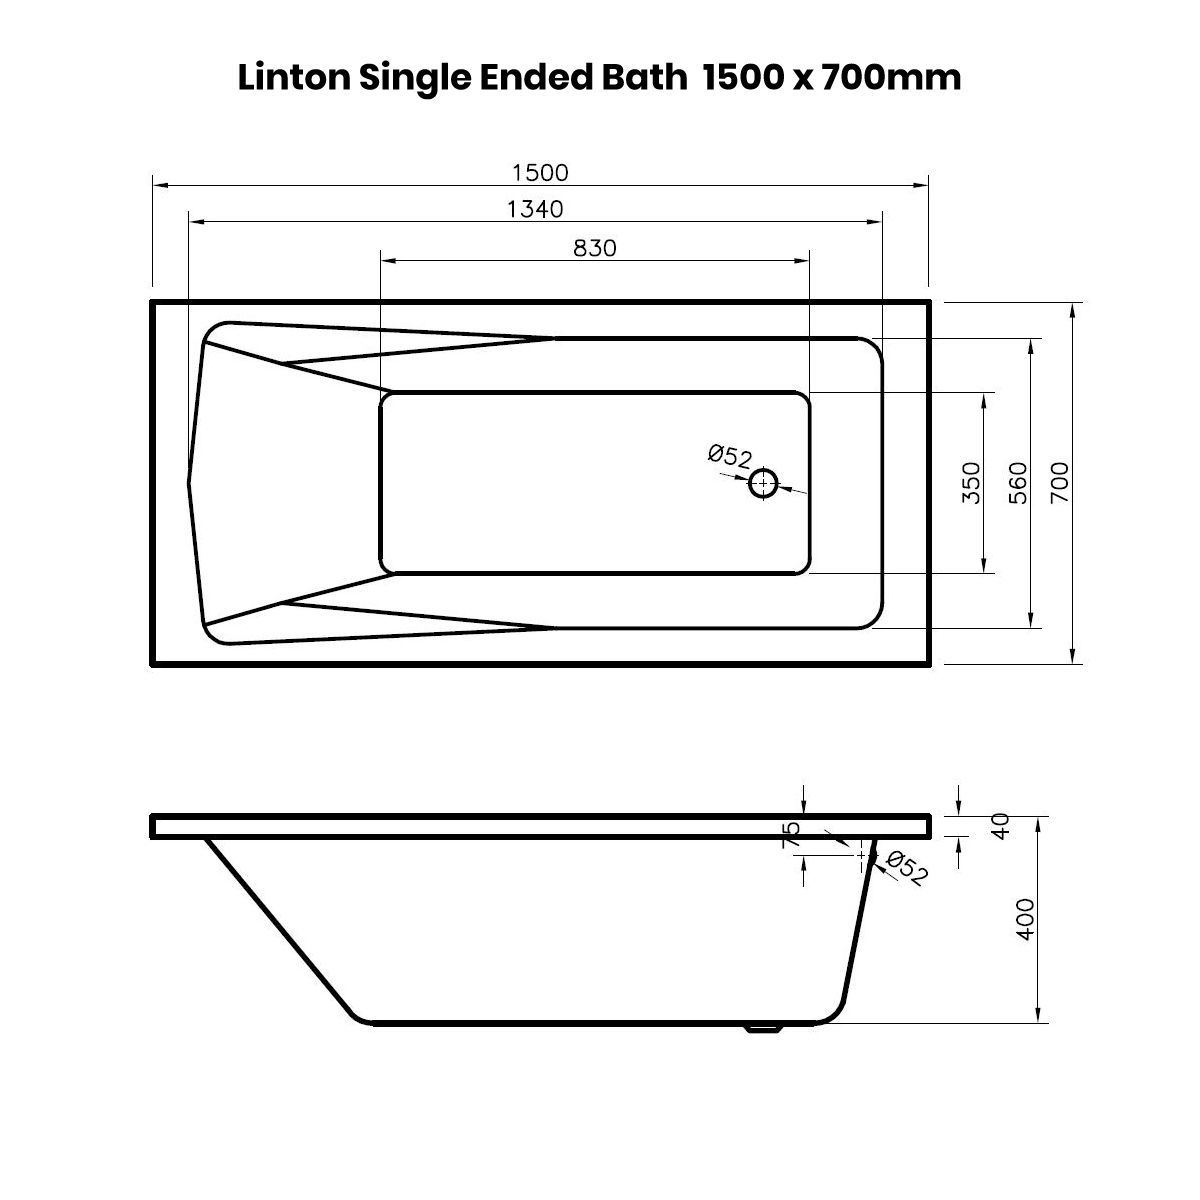 Premier Linton Single Ended Bath 1500 x 700mm Dimensions